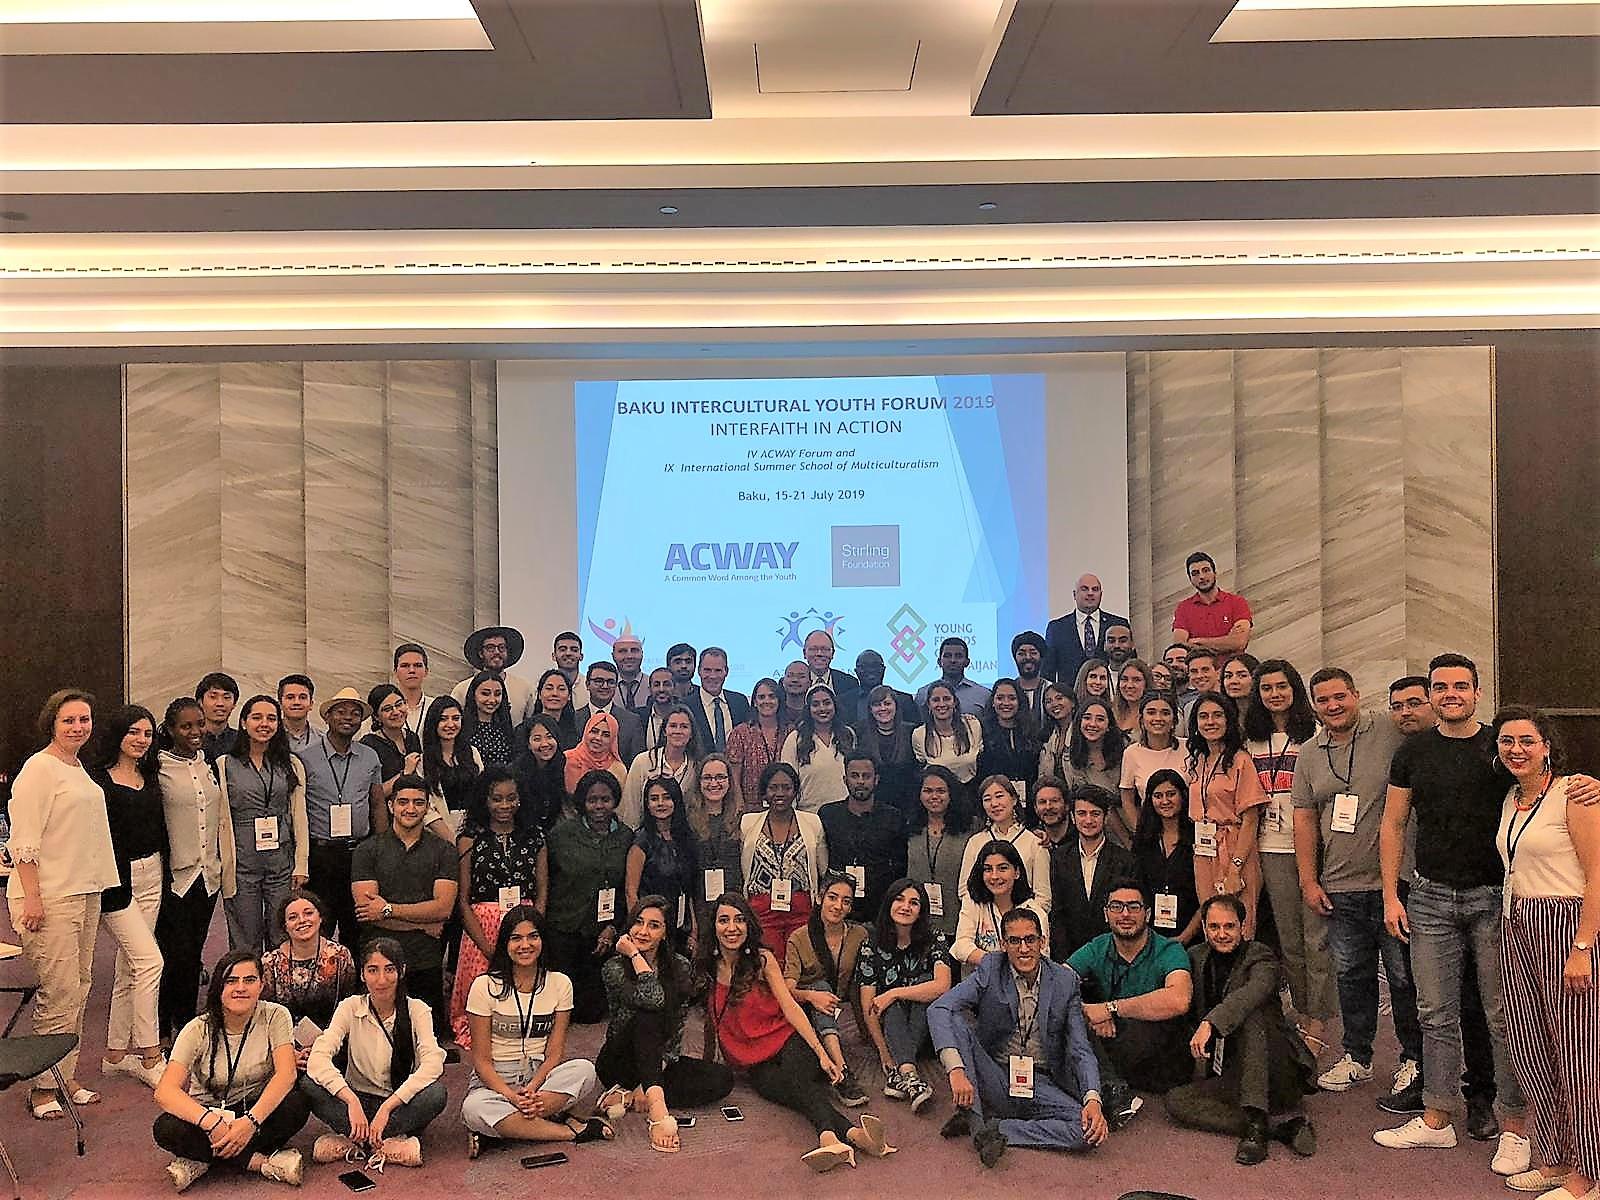 Baku International Youth Forum 2019 – Interfaith in Action